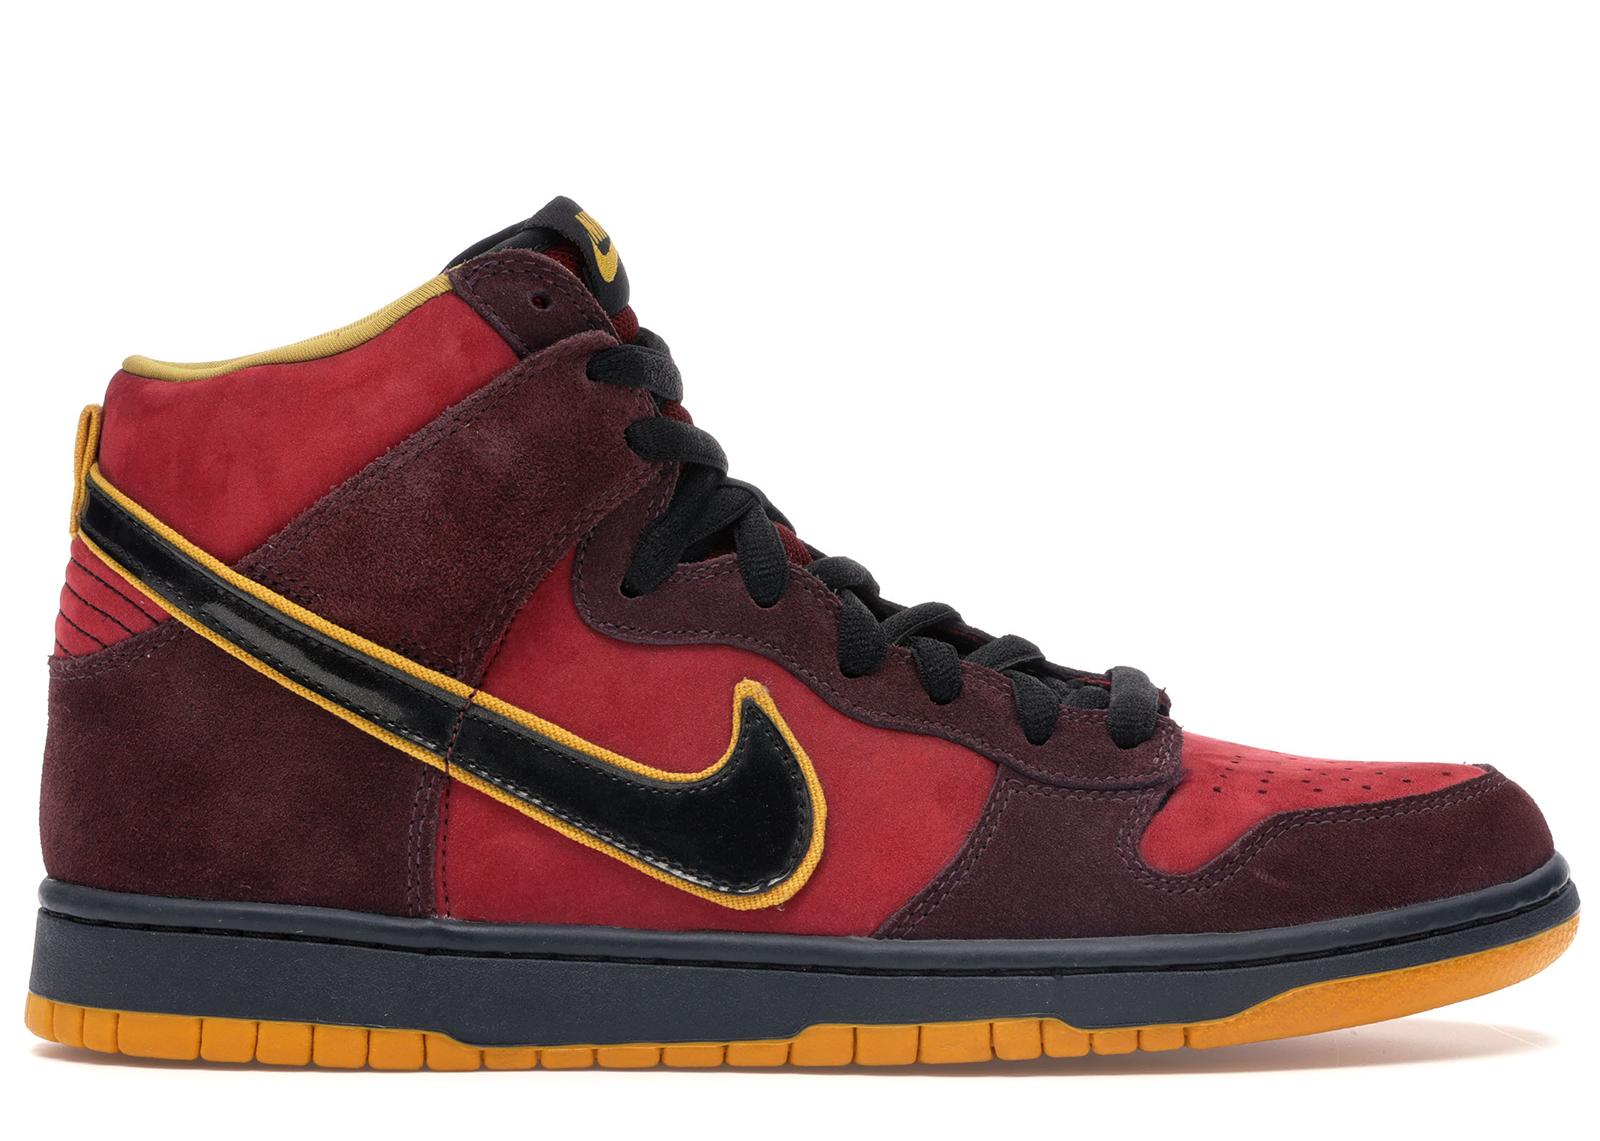 Nike Dunk SB High Iron Man - 313171-600